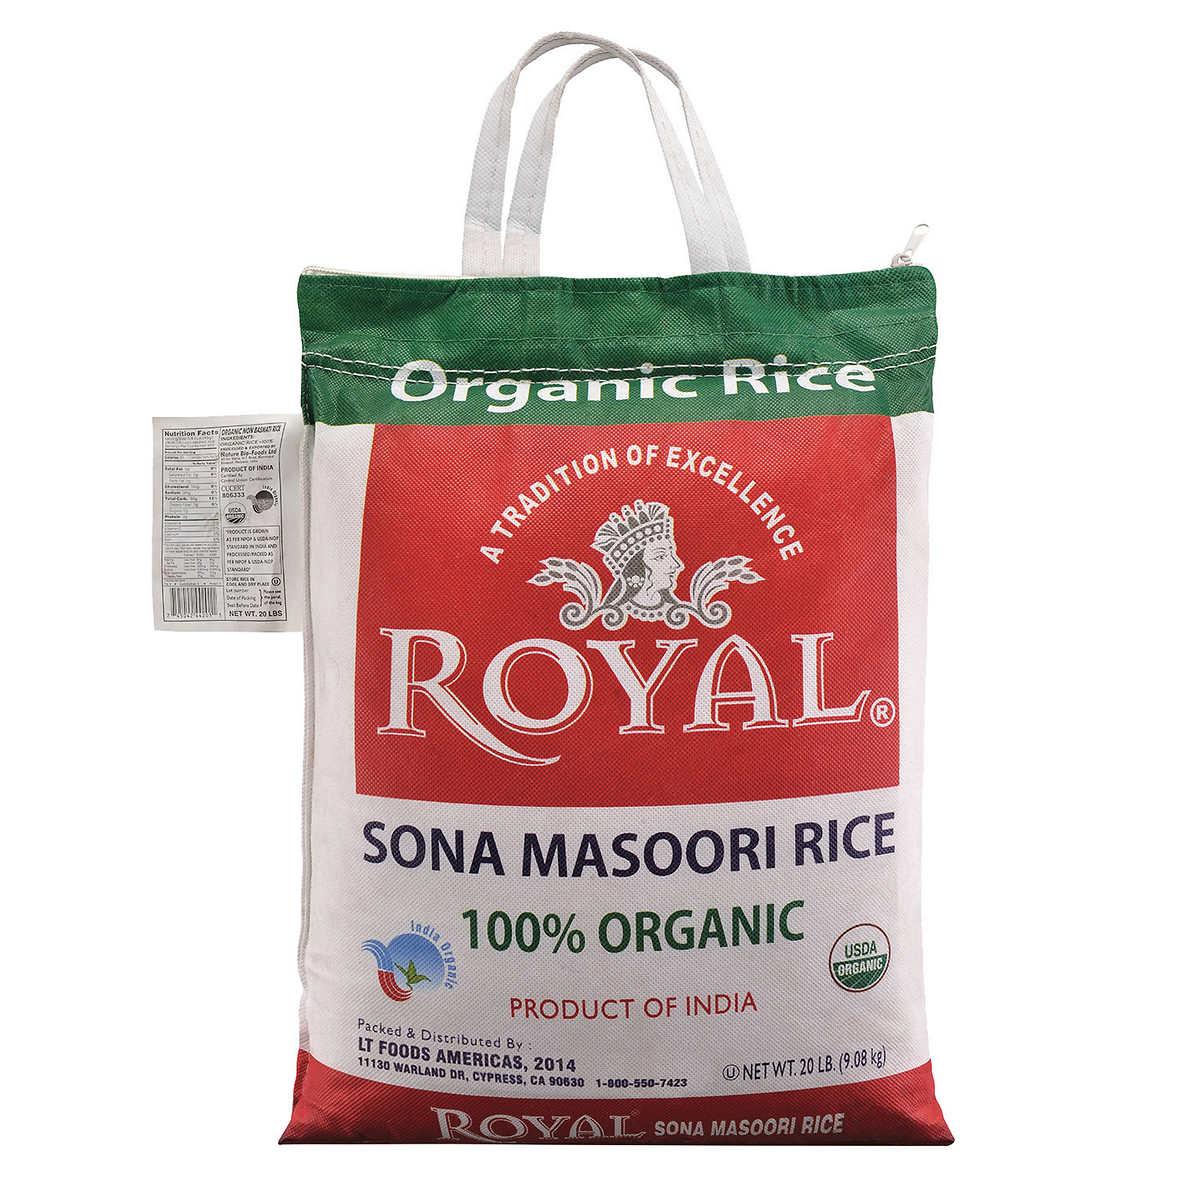 Royalanic Sona Masoori Rice, 20 Lbs